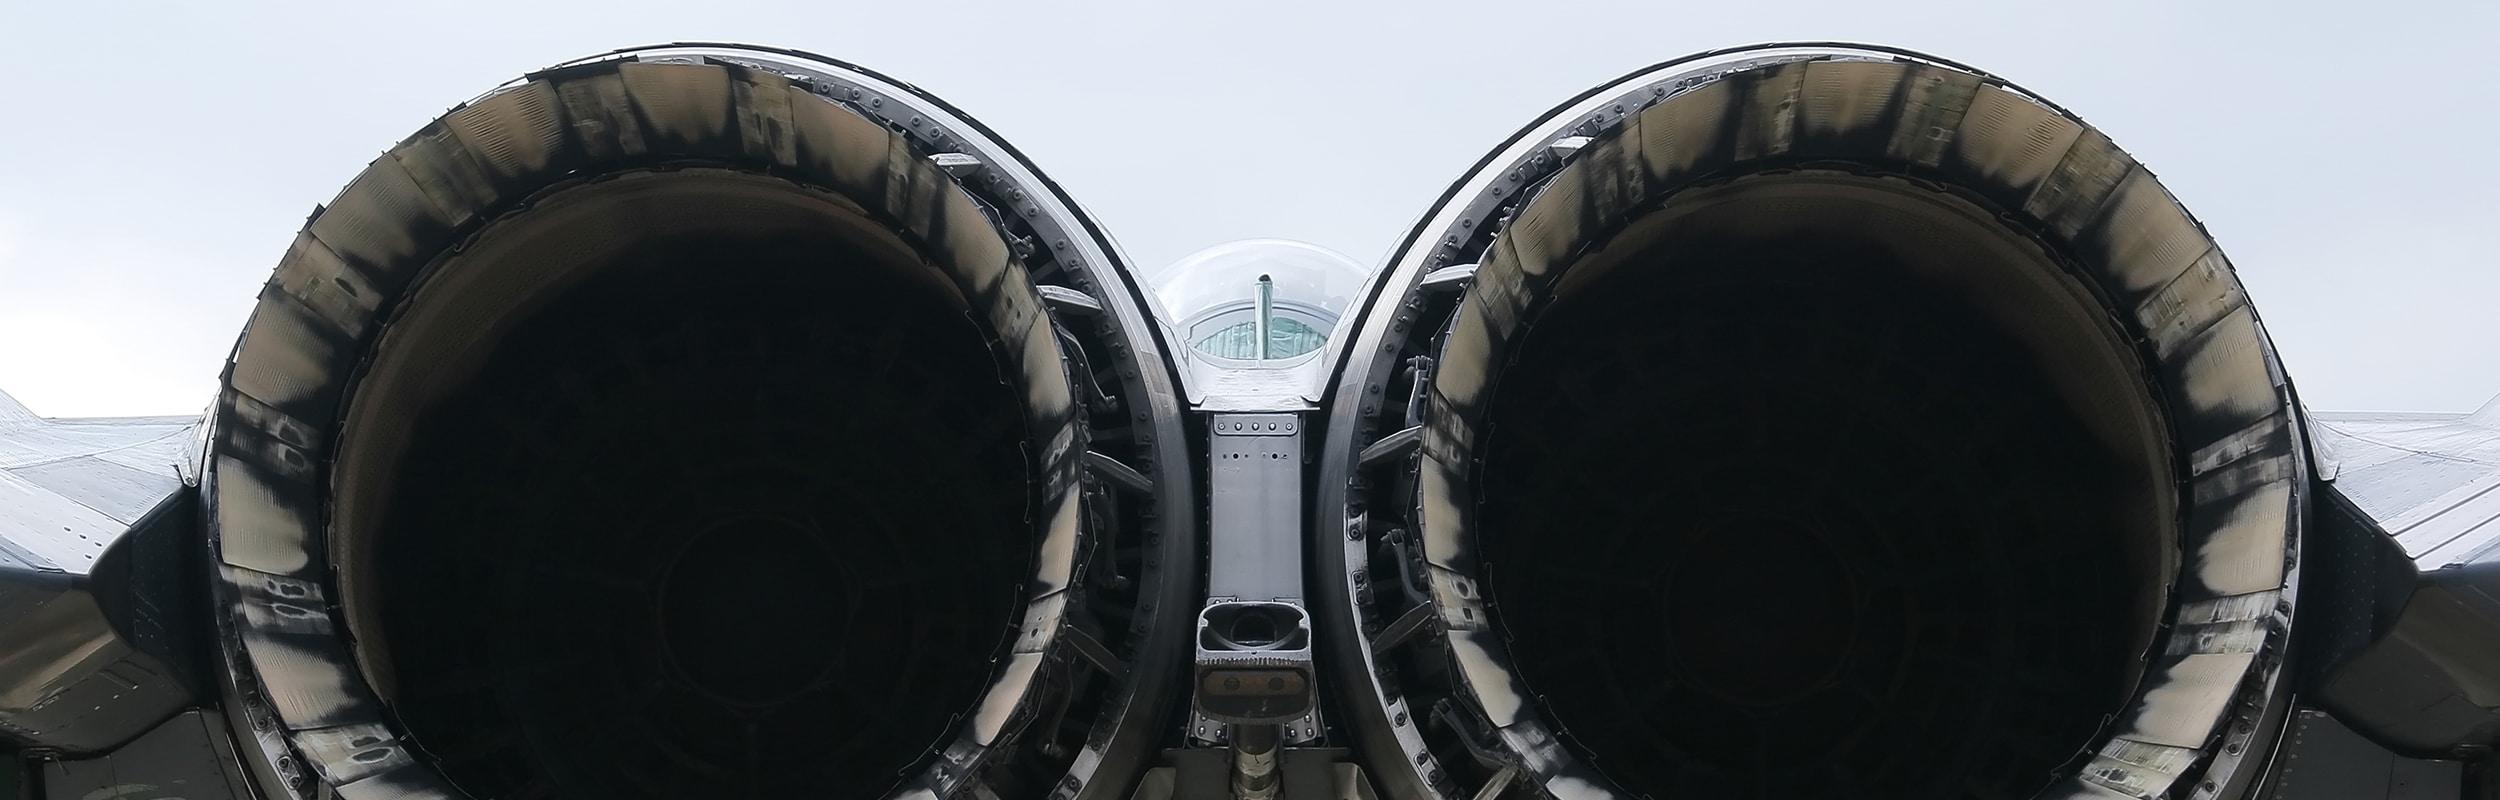 Big airplane engine